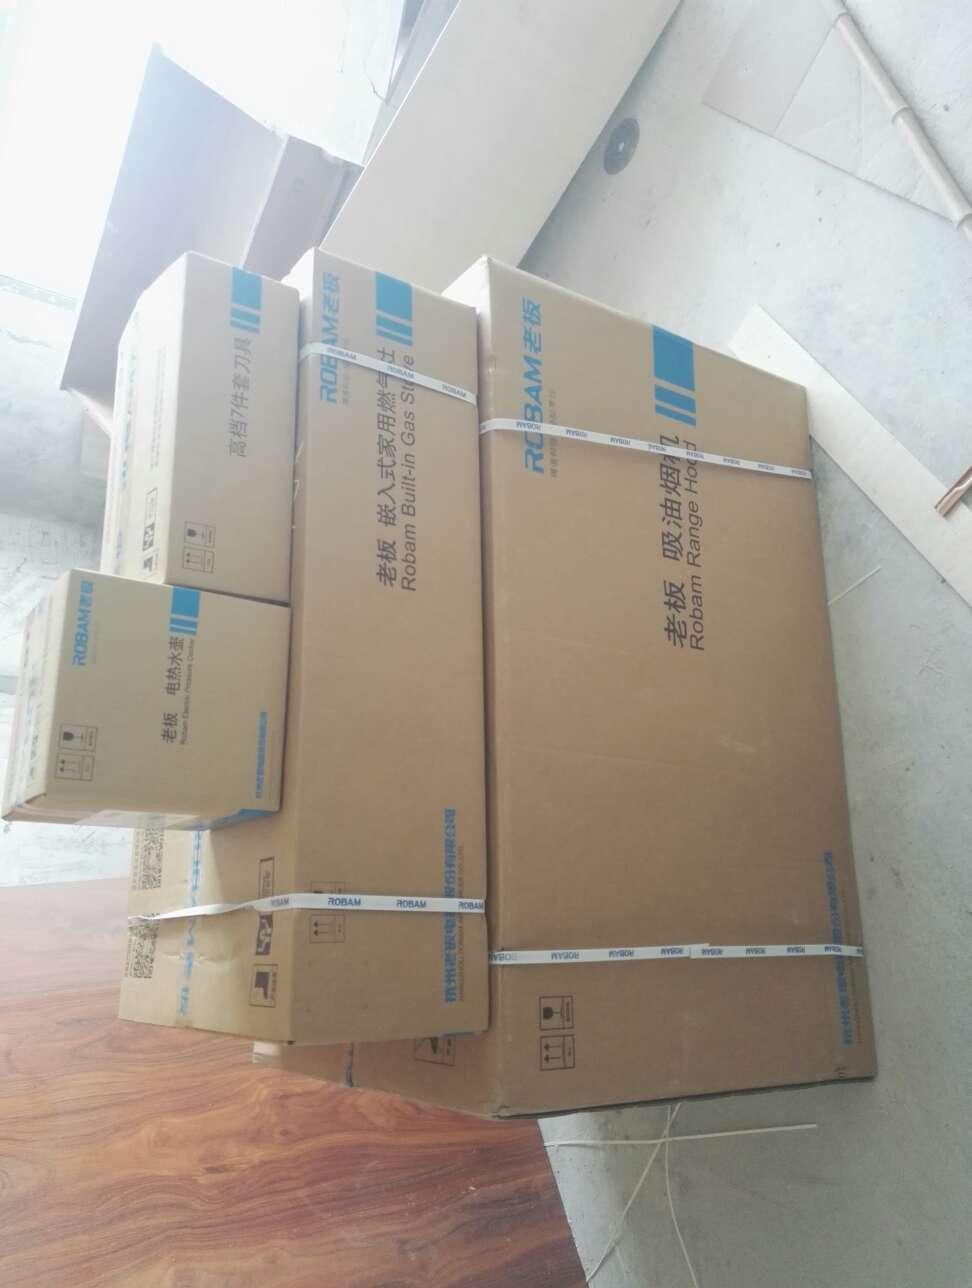 asics gt 2000 2 review 00243752 cheapestonline